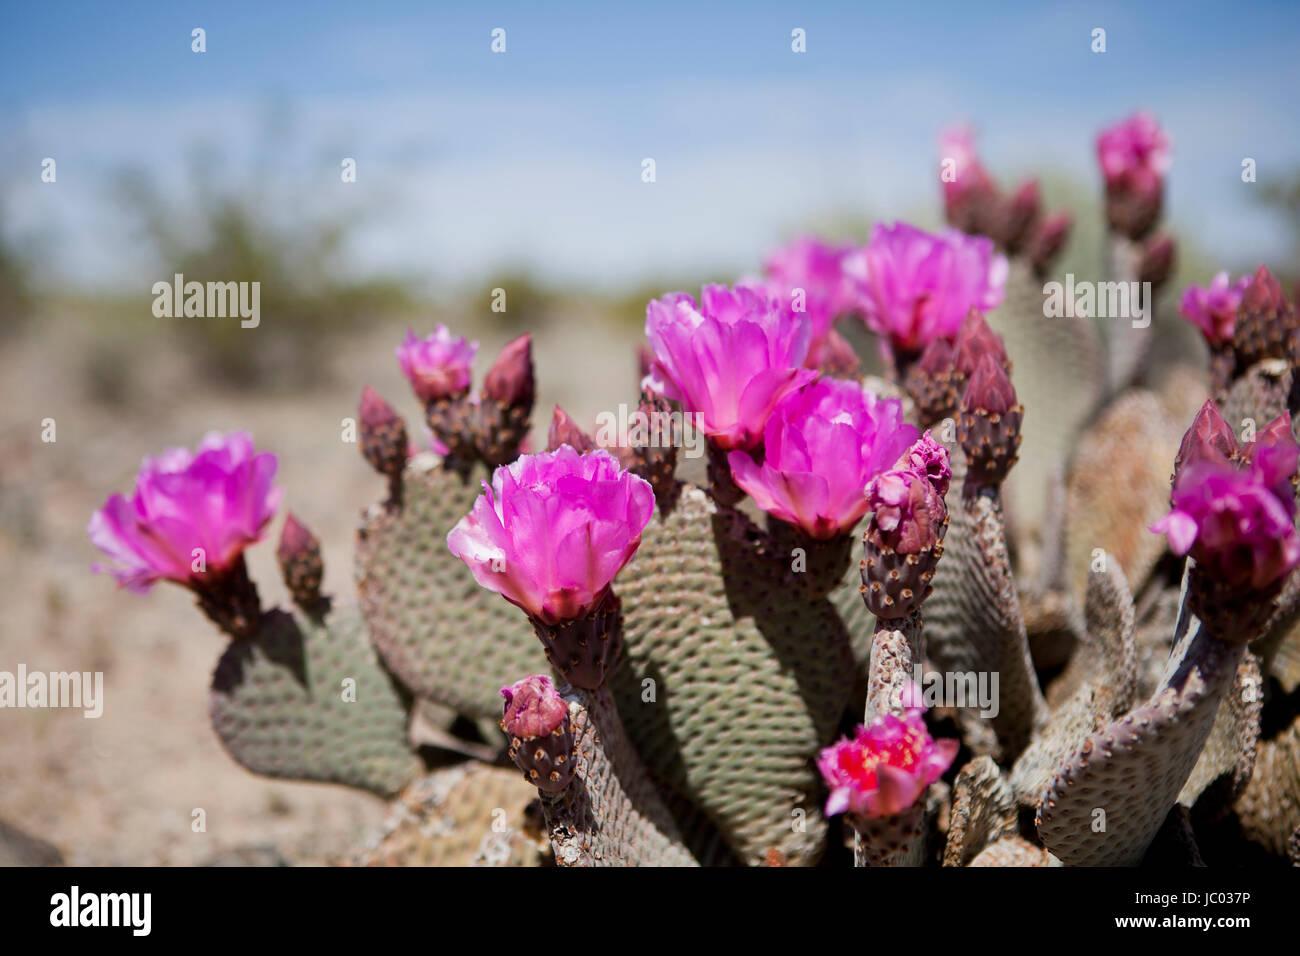 Pink desert flower stock photos pink desert flower stock images beavertail cactus flowers optuntia mojave desert california usa stock image mightylinksfo